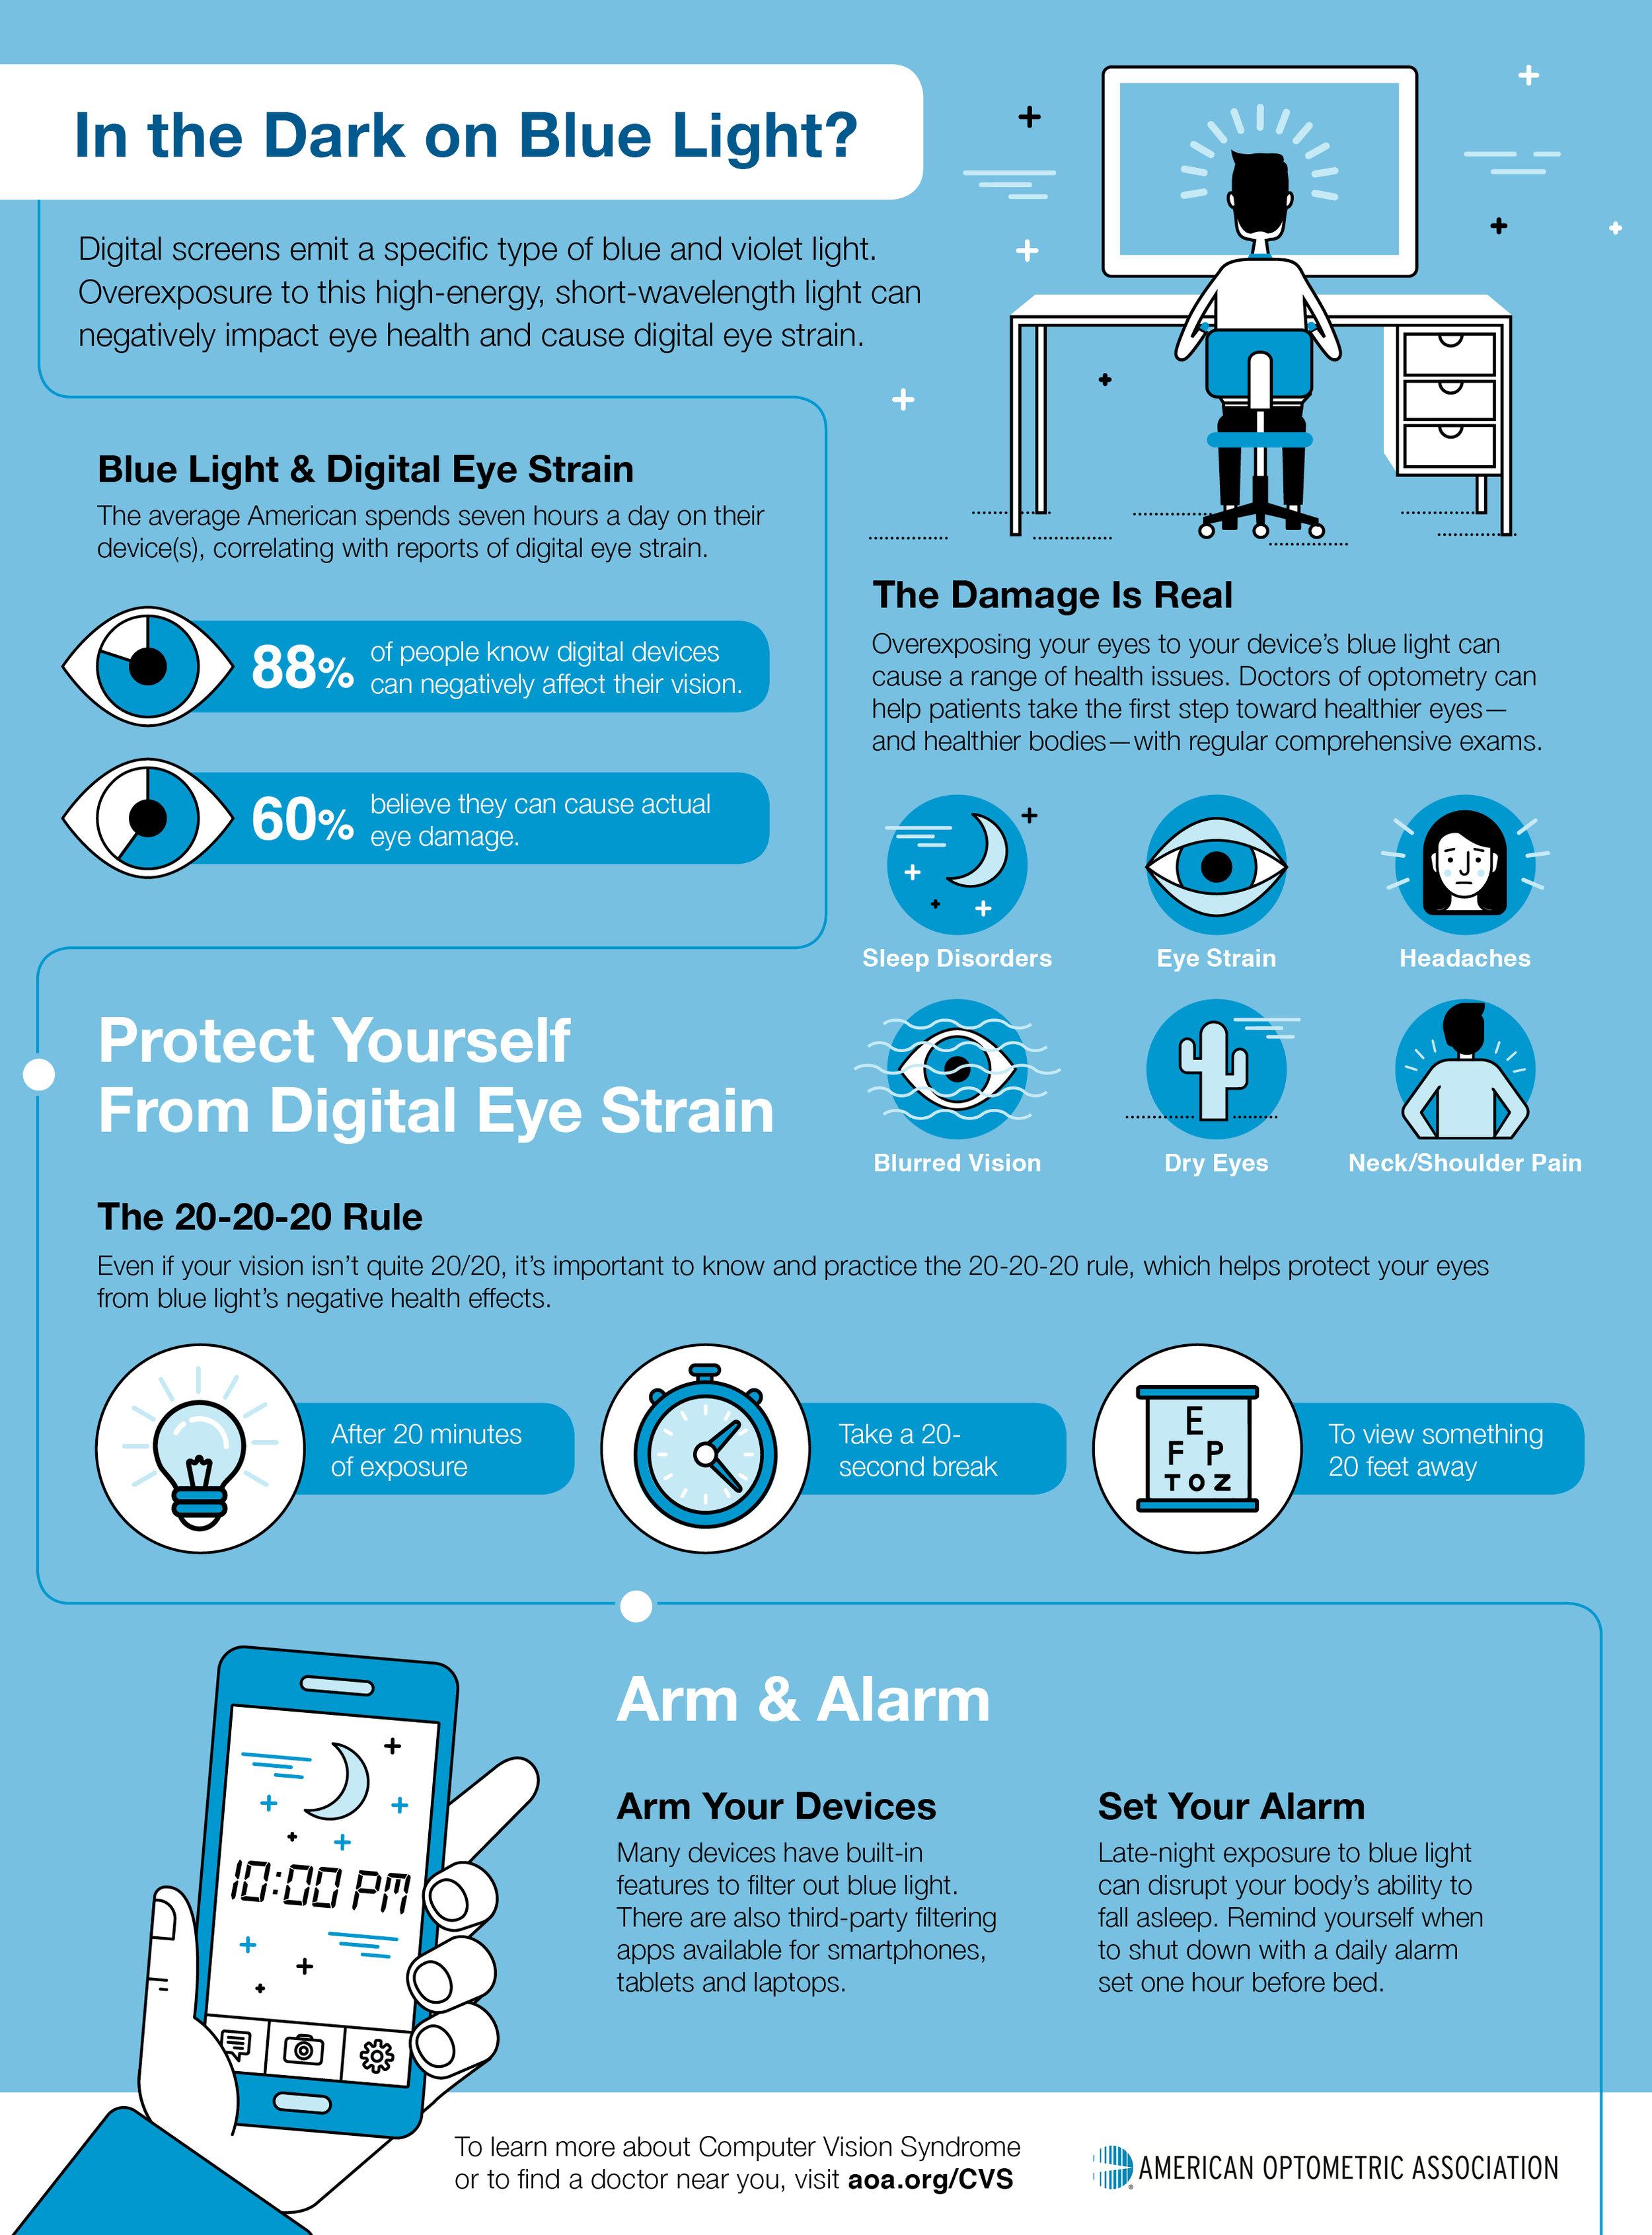 AOA_Blue-Light_infographic.jpg